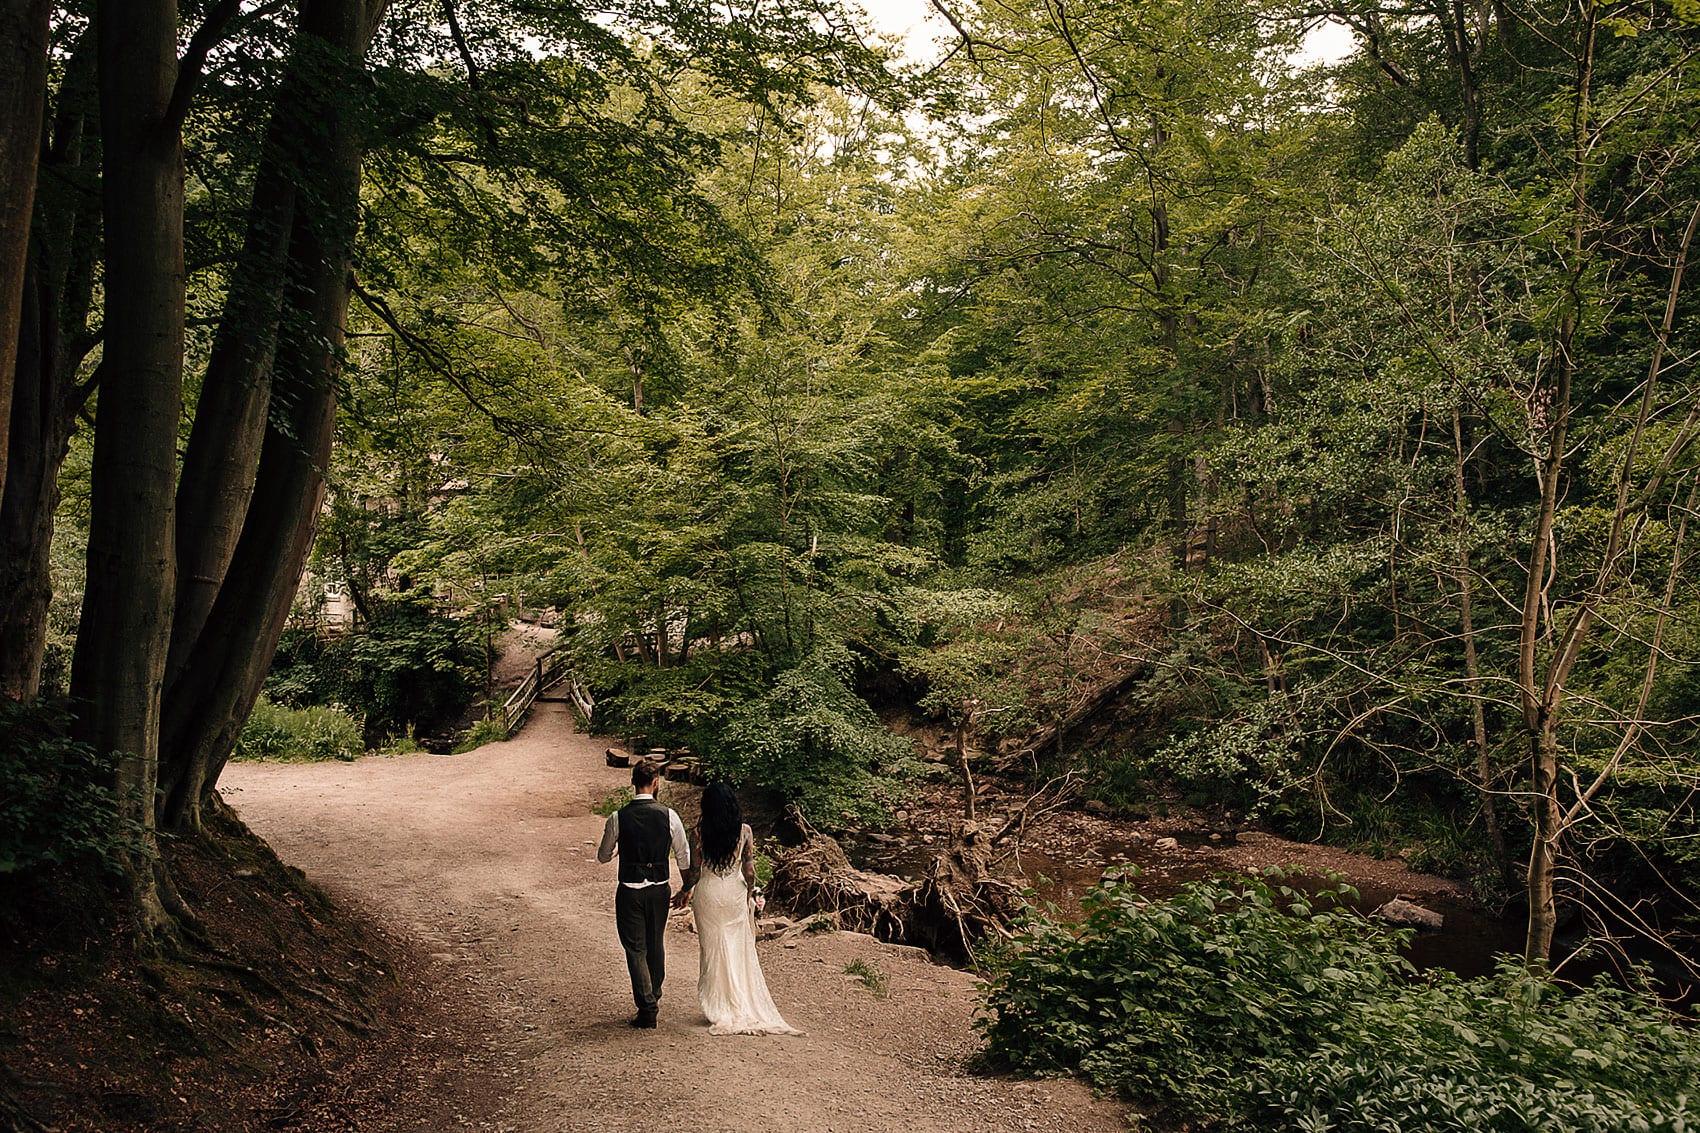 wedding woodland photography adventurous couples